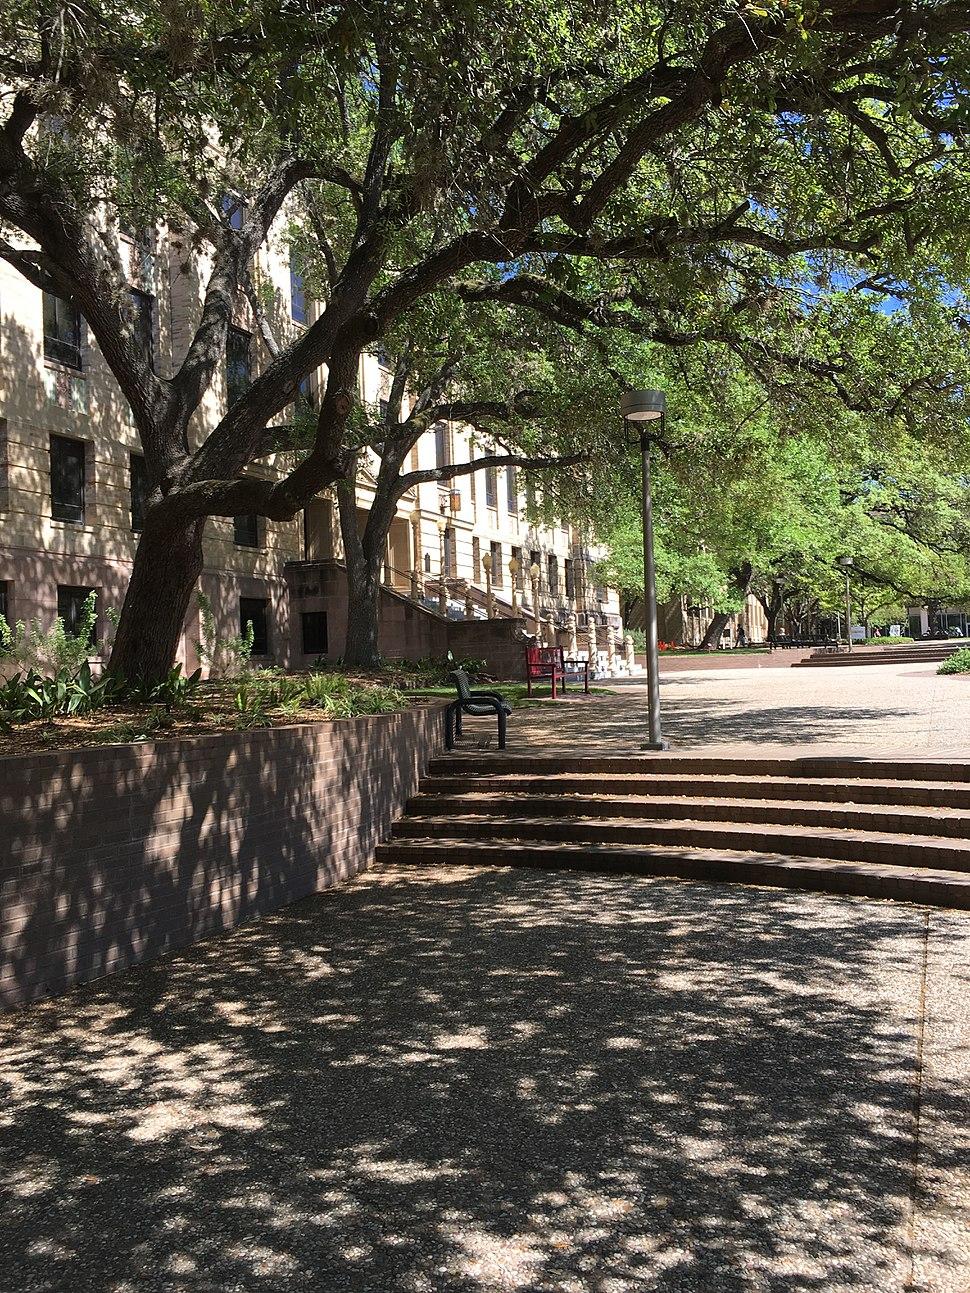 Texas A&M University Chemistry Building